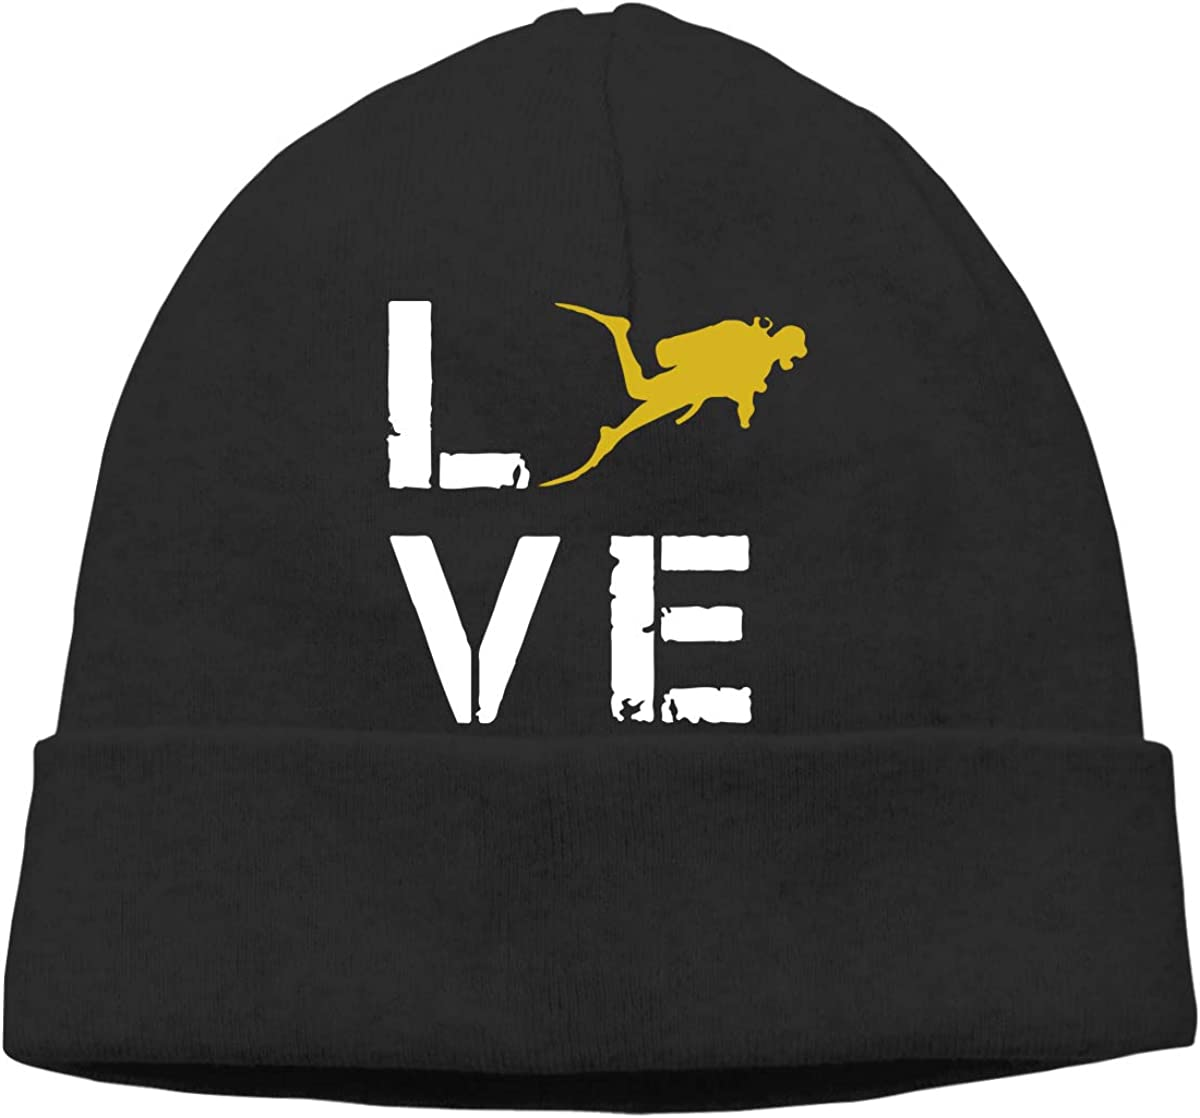 Love Scuba Diving Men /& Women Knitting Wool Warm Sports Beanie Hats